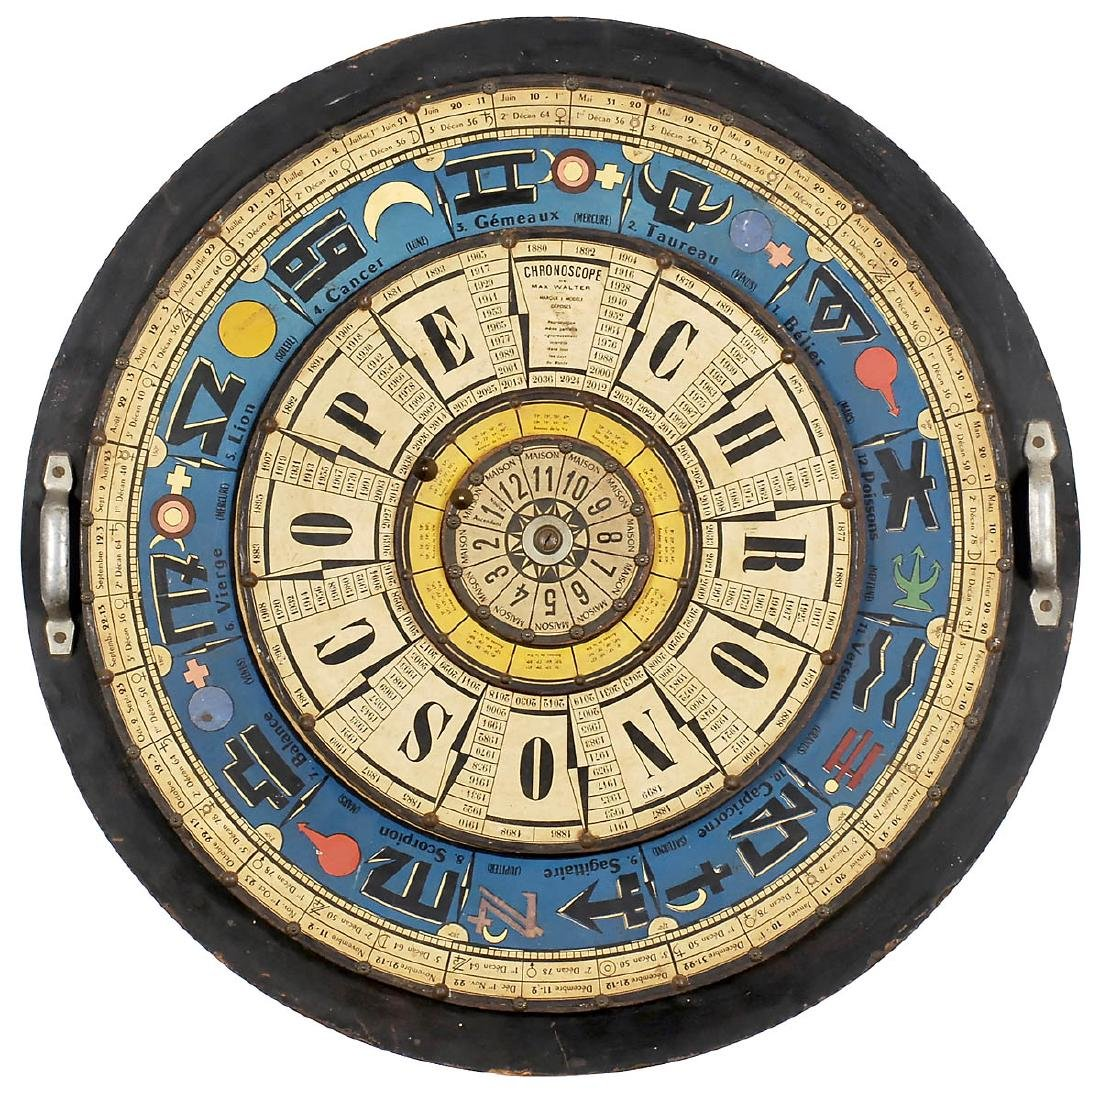 Le Chronoscope de Max Walter, c. 1900